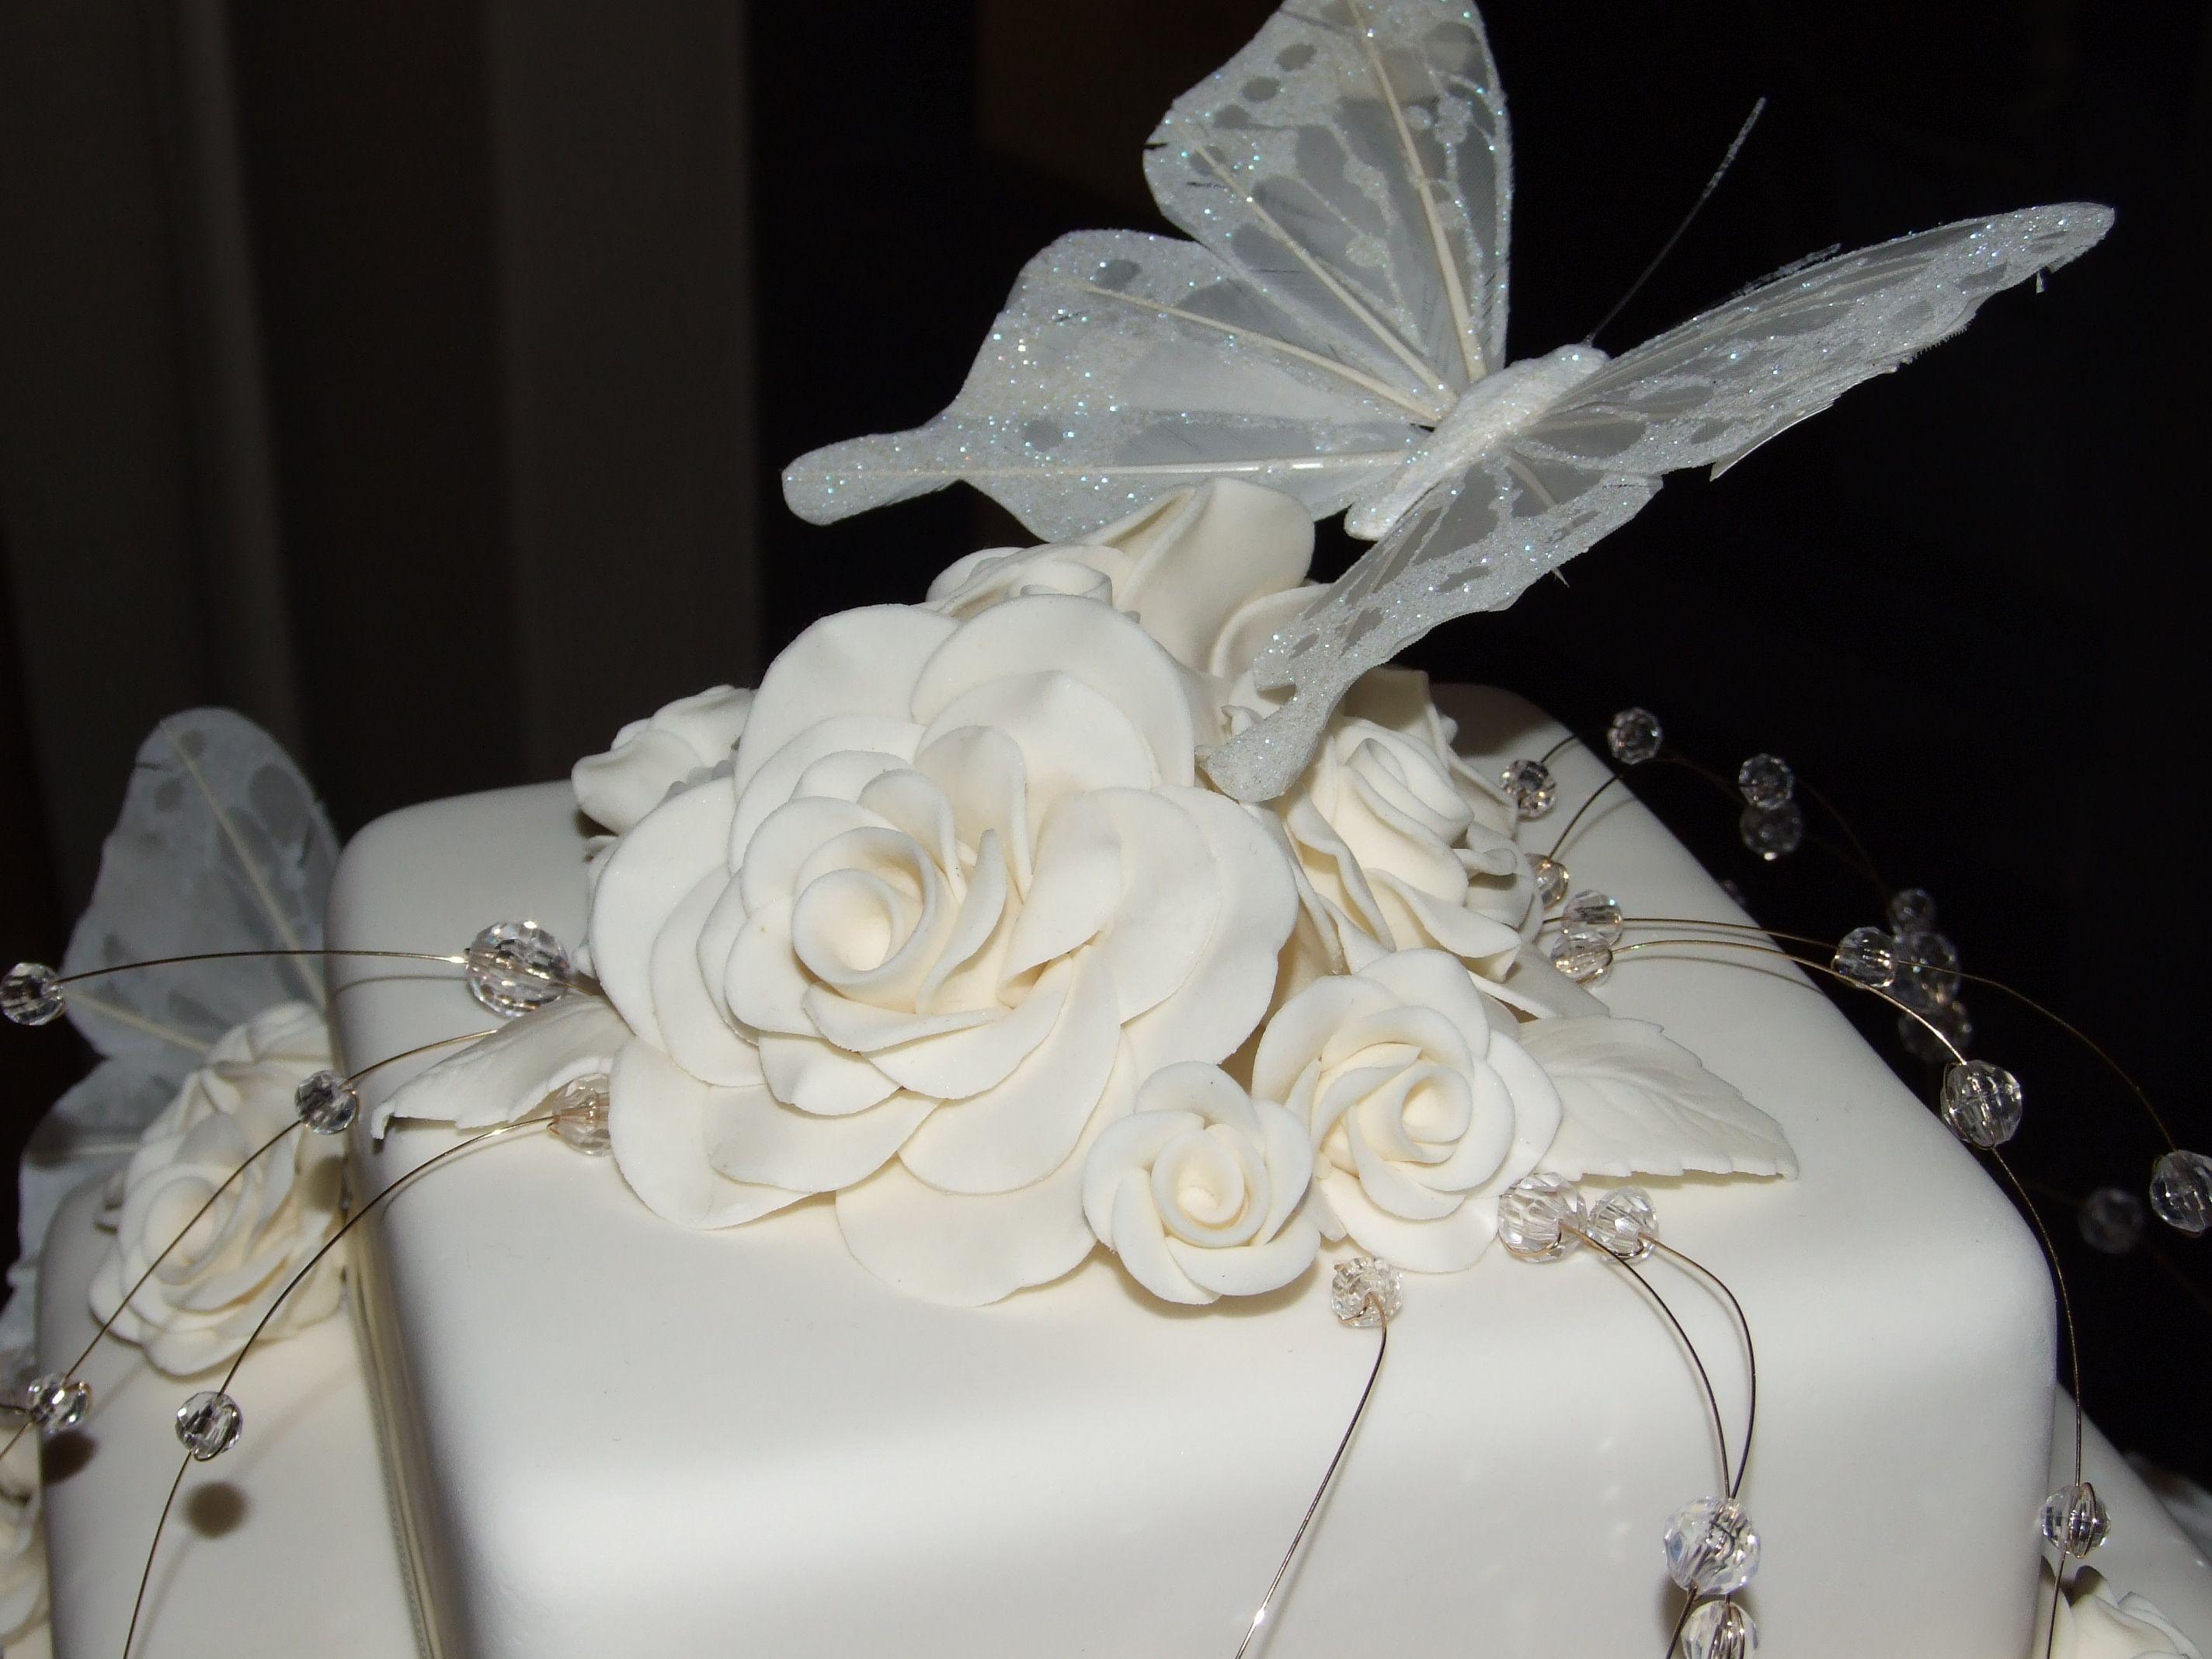 Maroon and white wedding decor  Jewels u Butterflies Wedding Cake  my sweet dreams  Pinterest